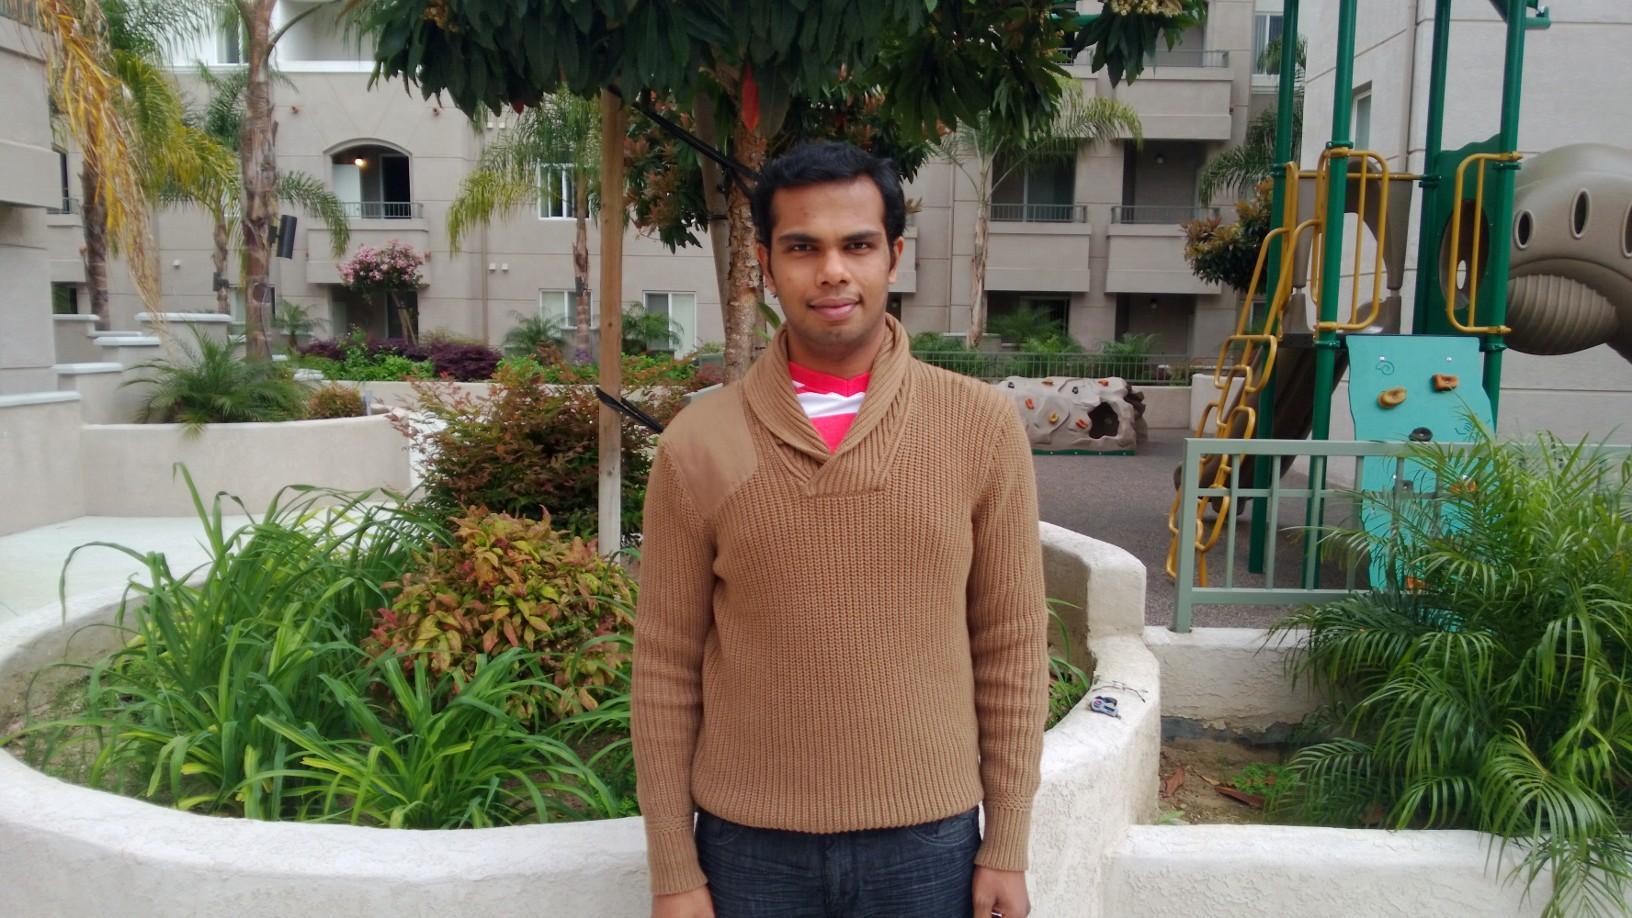 Shyam Visamsetty